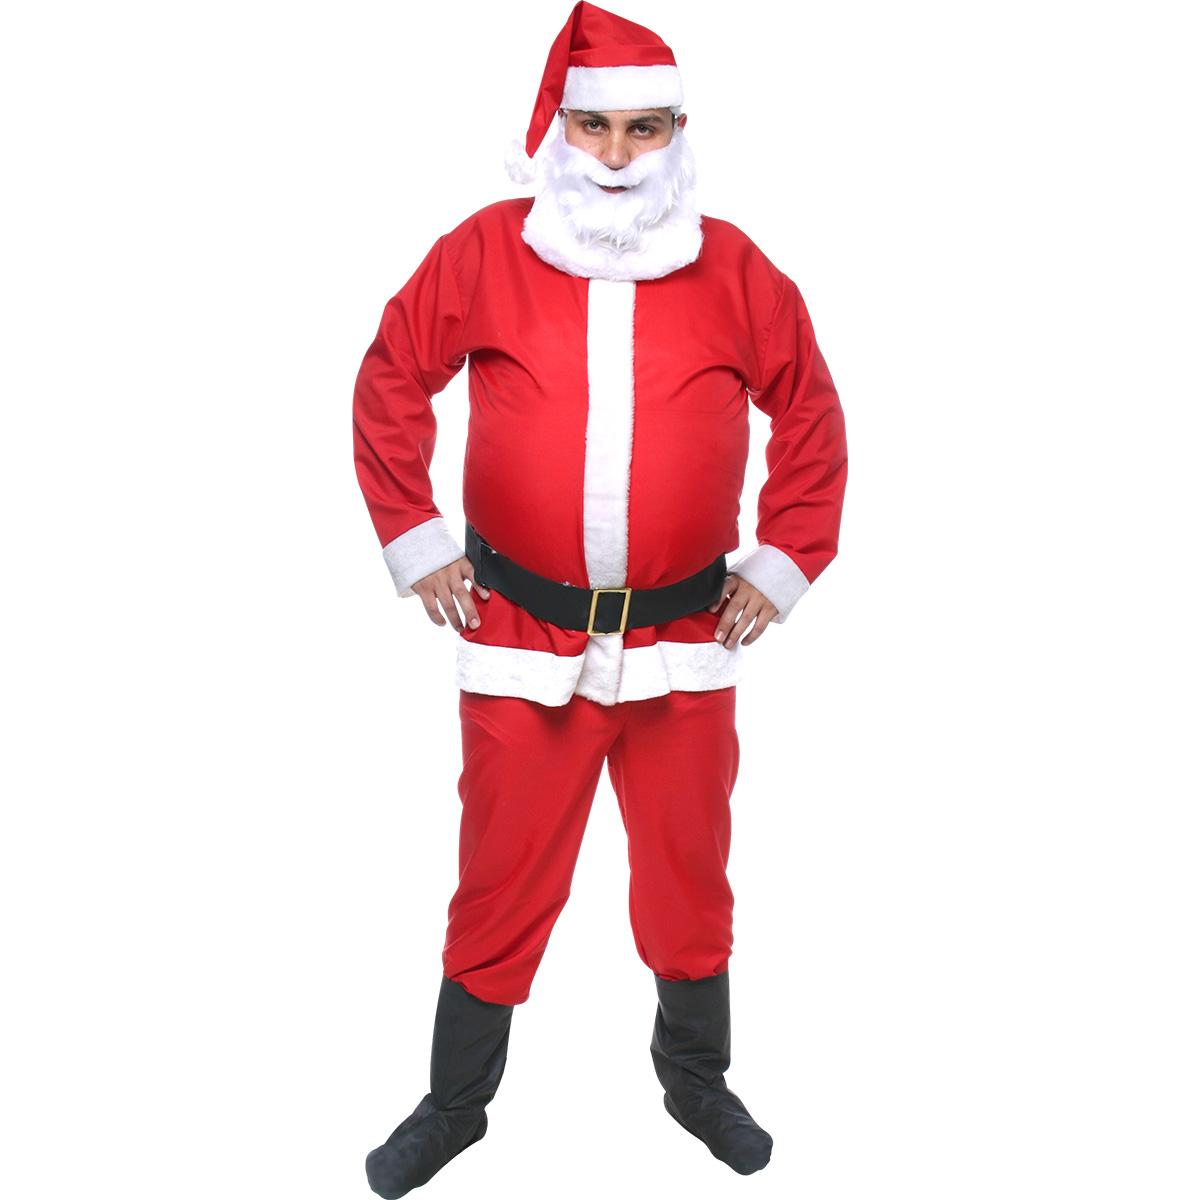 Fantasia Papai Noel Adulto 1f2c9cc965